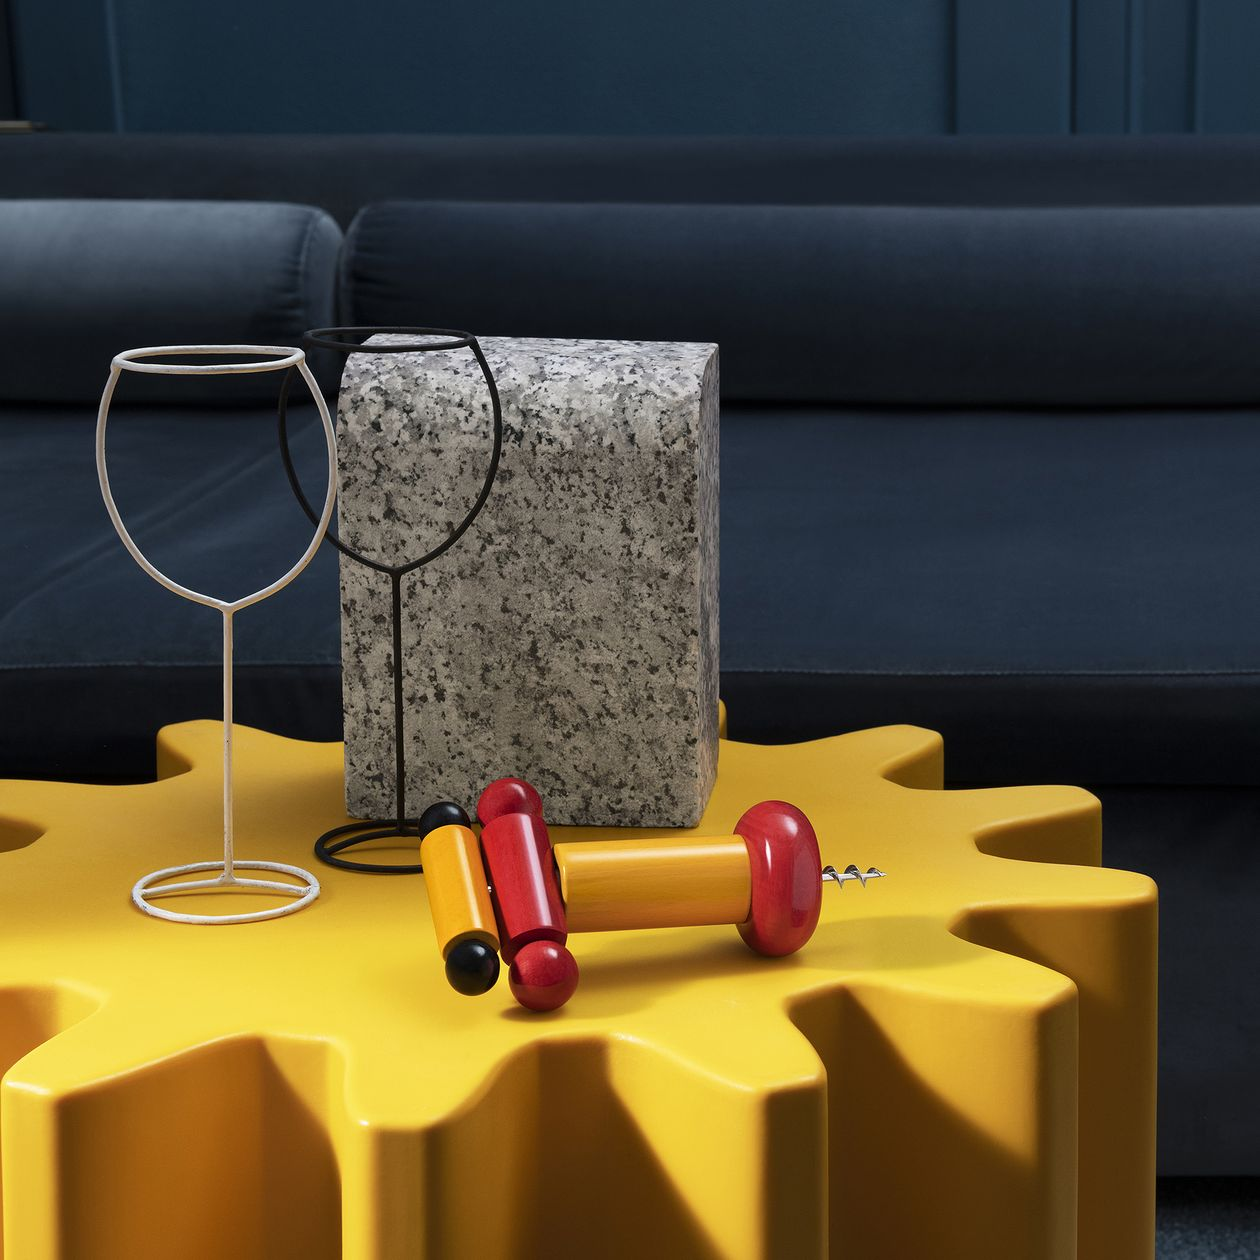 Alessi Sottsass corkscrew, yellow - red - black